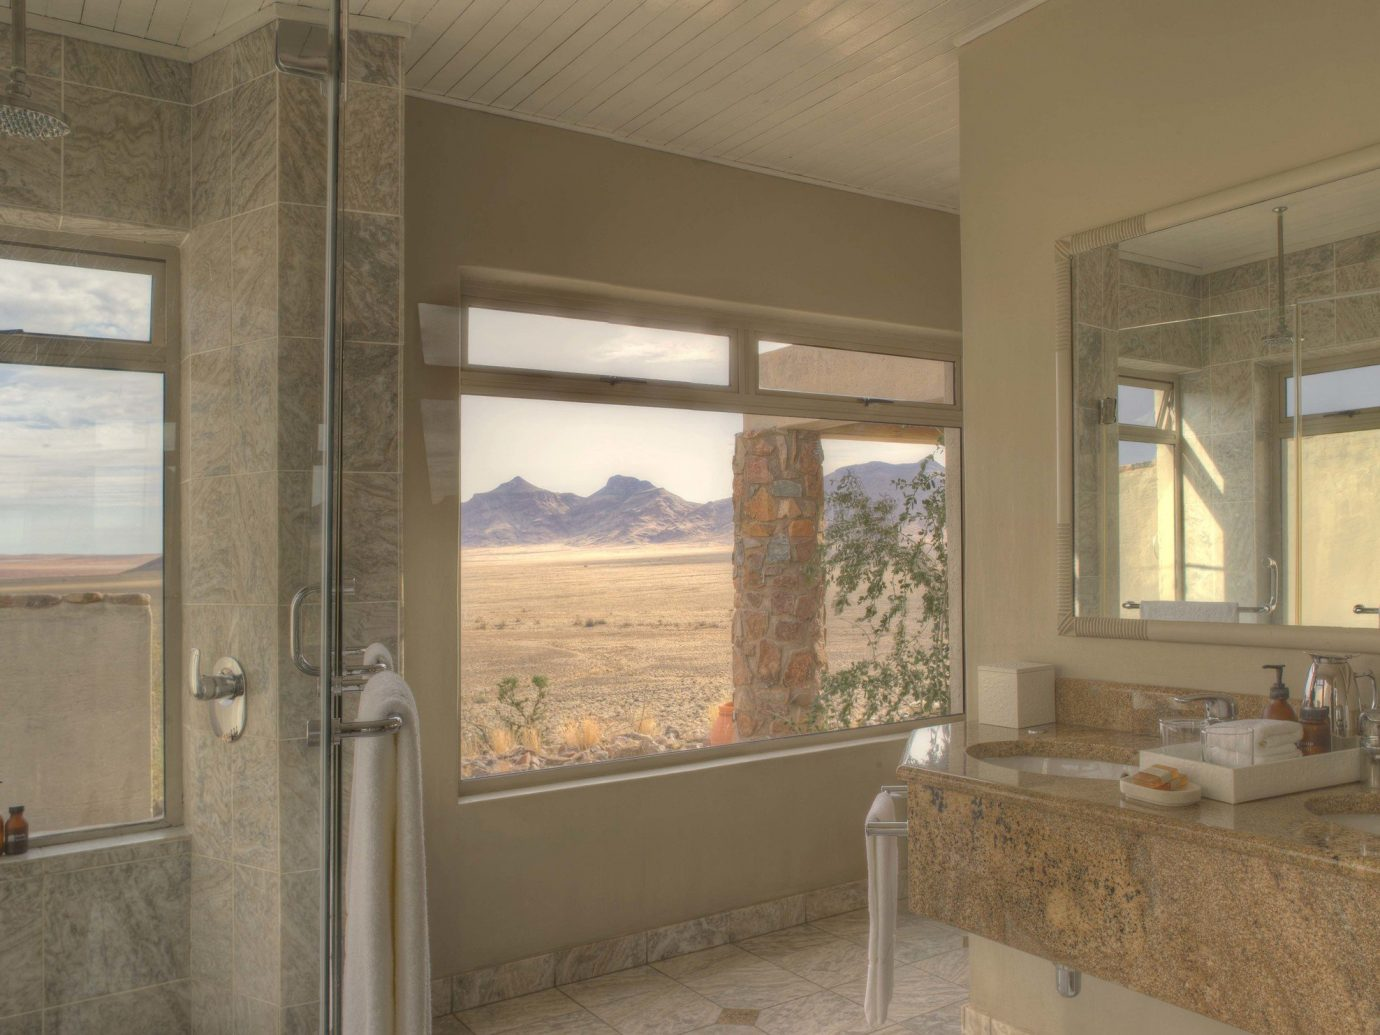 Hotels Offbeat window indoor bathroom property room ceiling home real estate estate sink tub interior design Bath door floor house bathtub tile